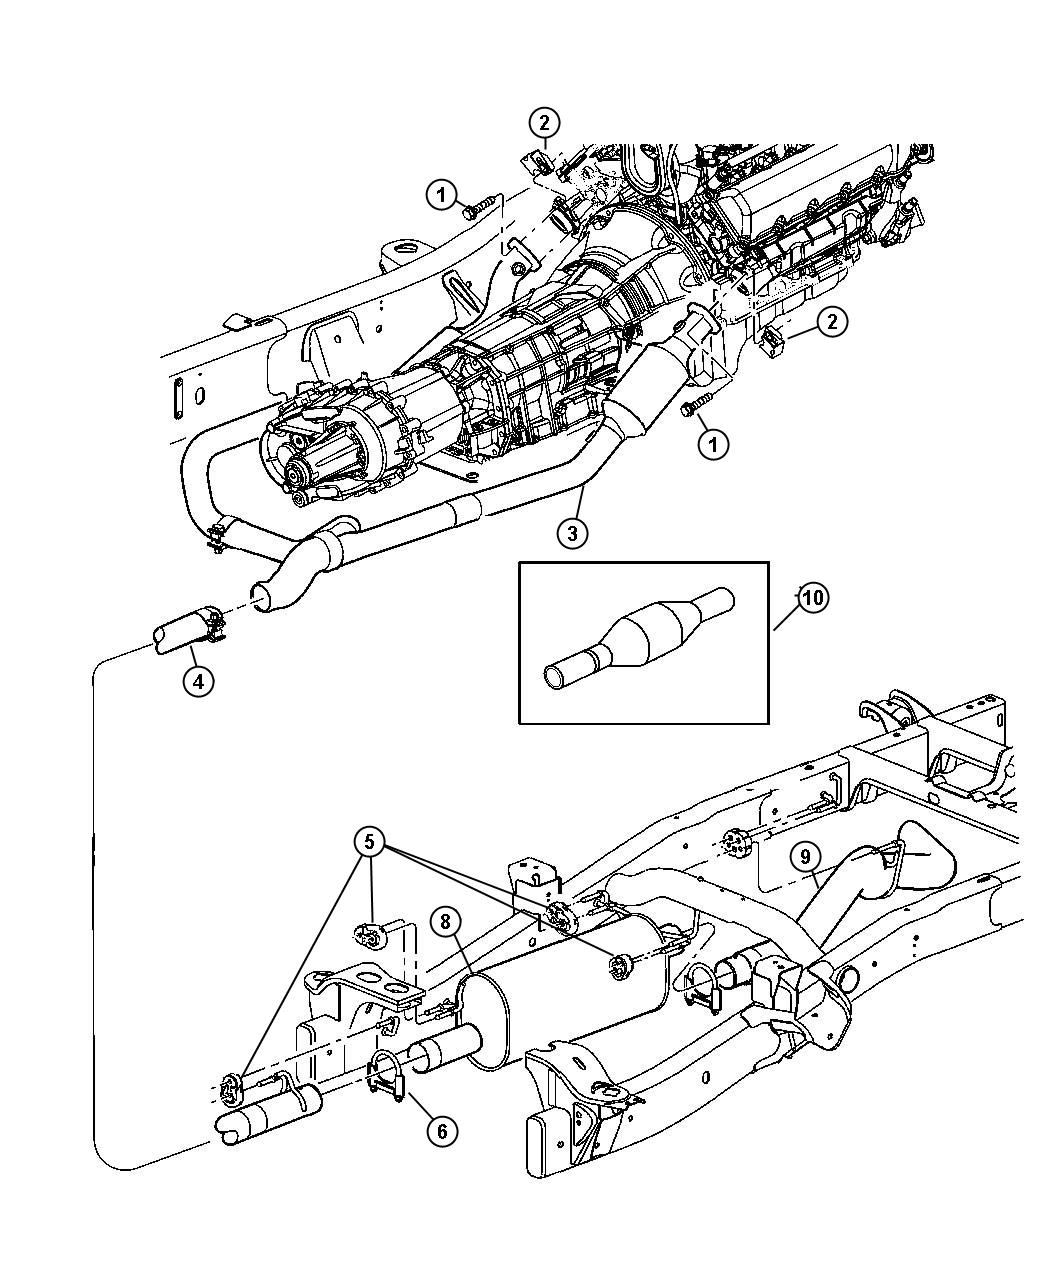 Dodge Durango Pipe Exhaust Extension